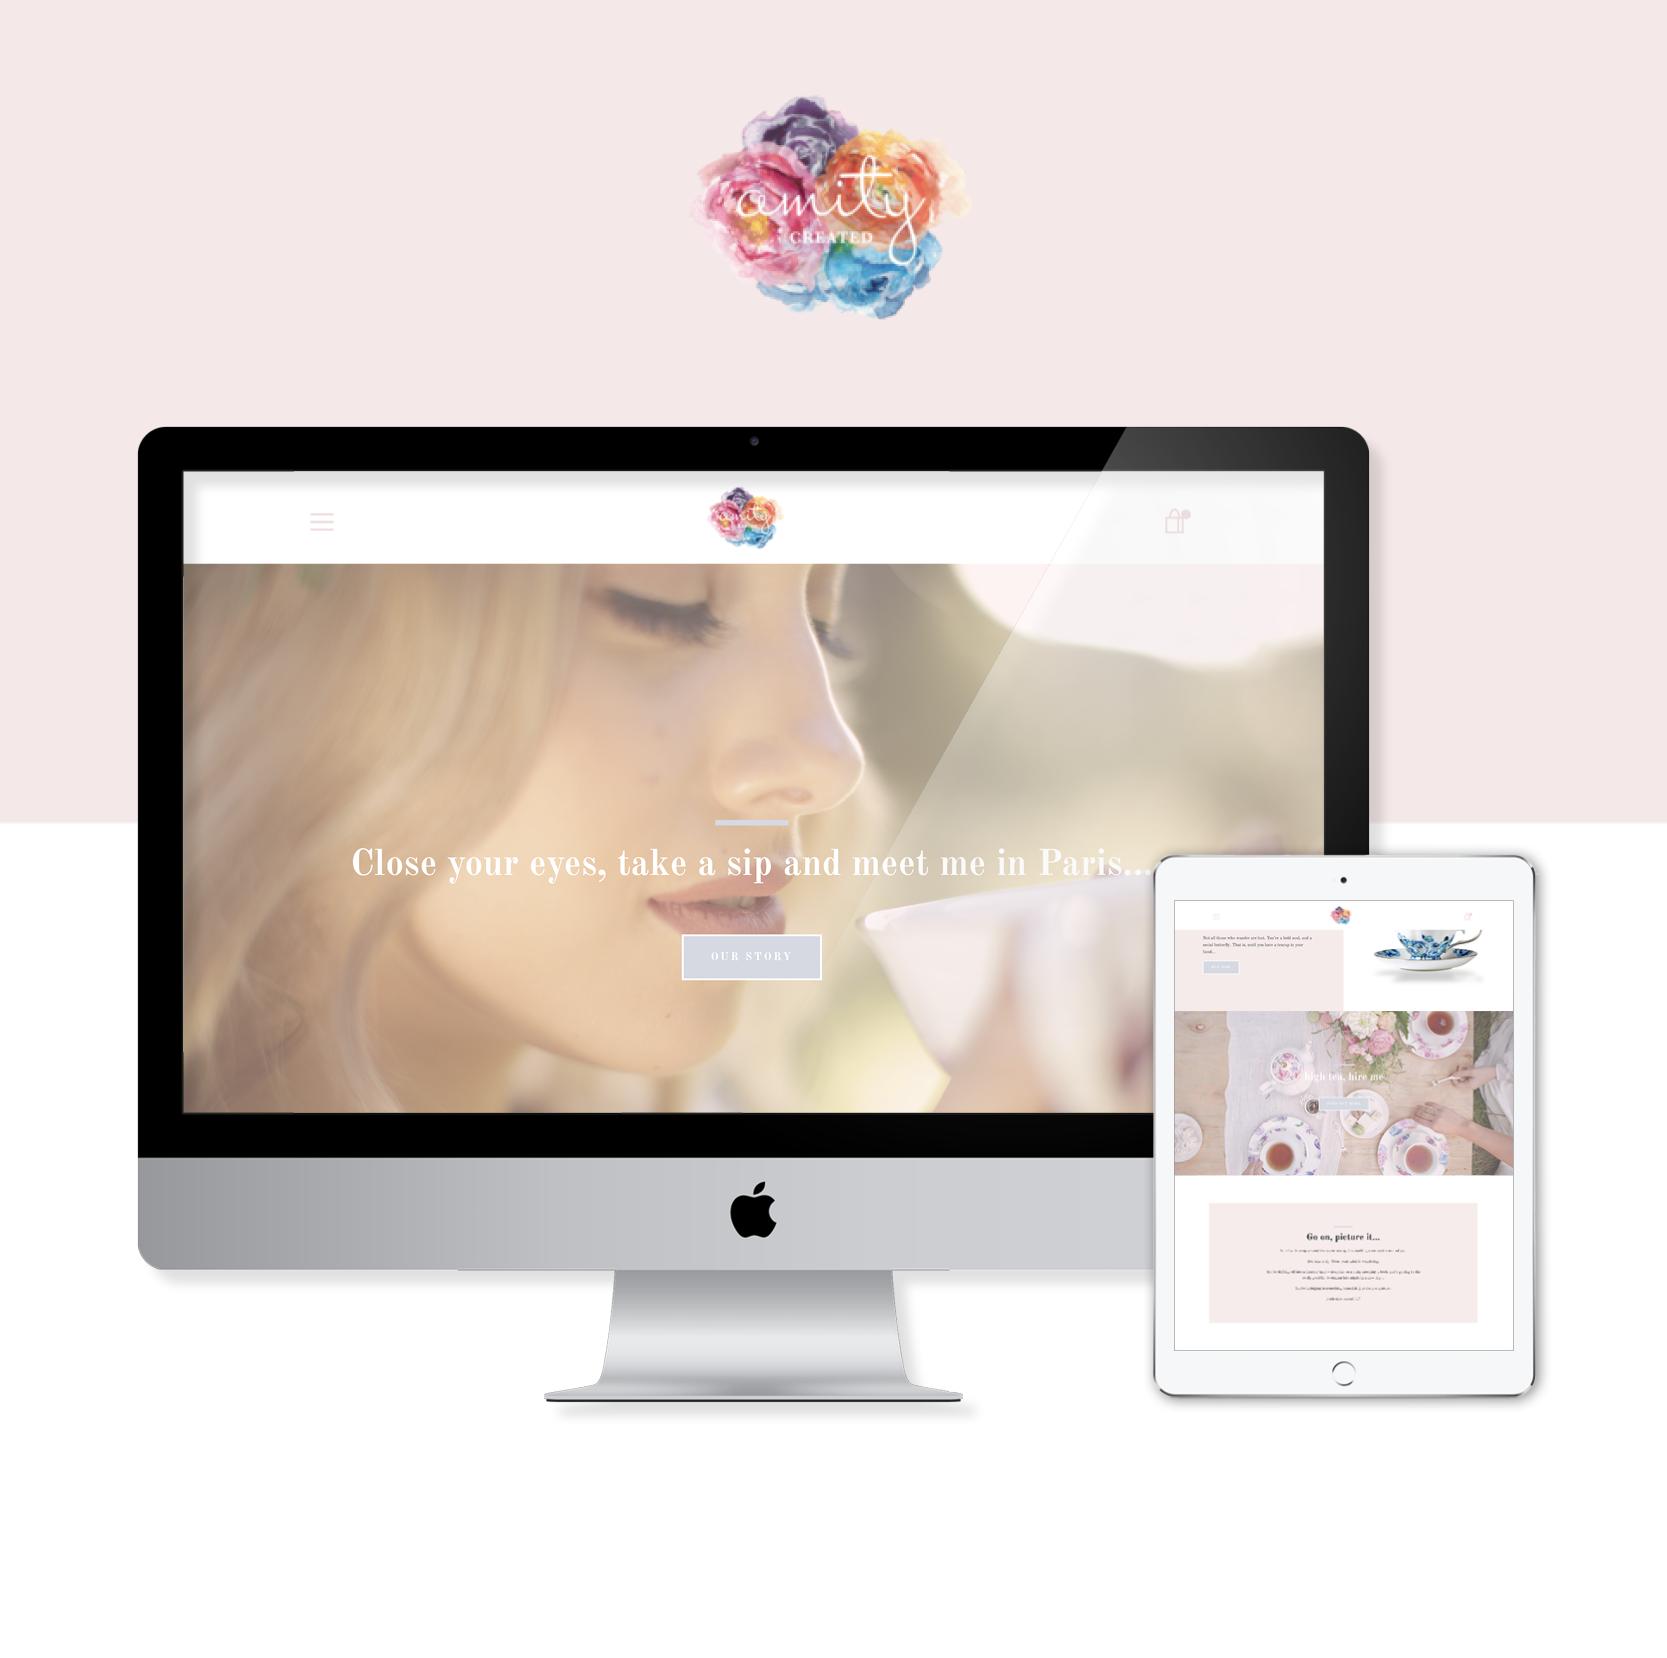 Amity Created iMac and iPad Website Sneak Peak